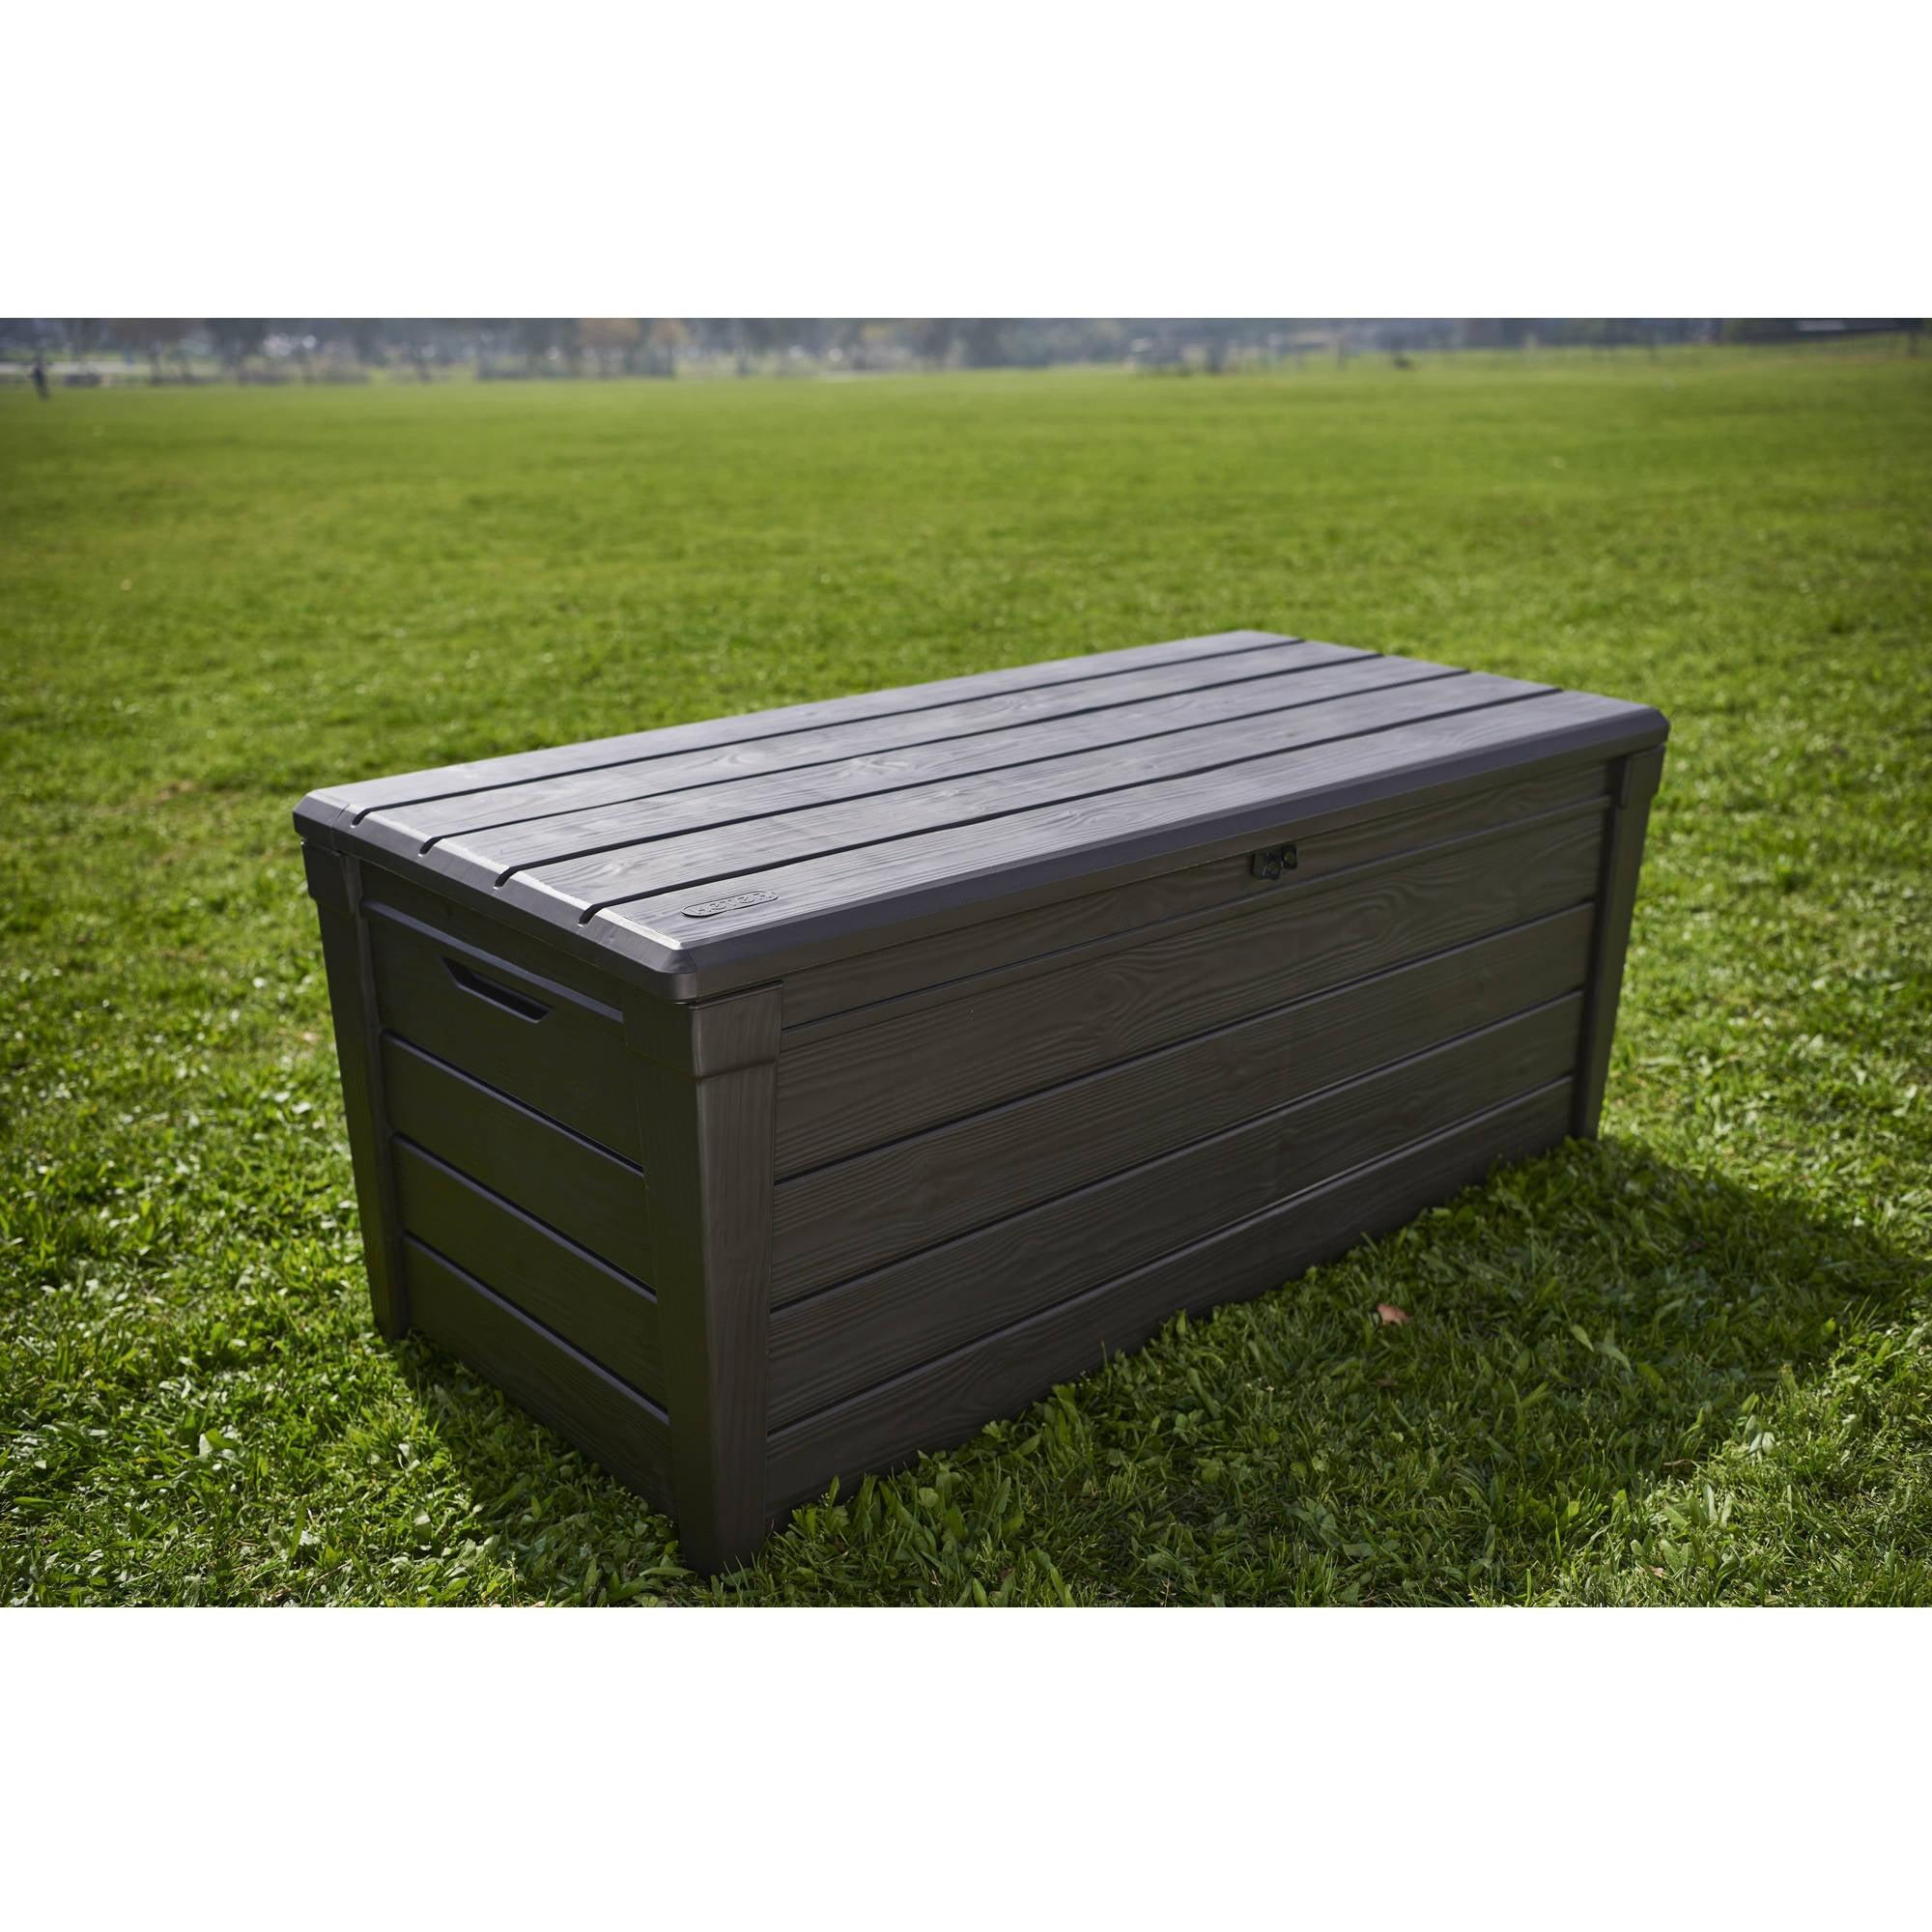 bench brand box boxes lid rubbermaid c split deck storage